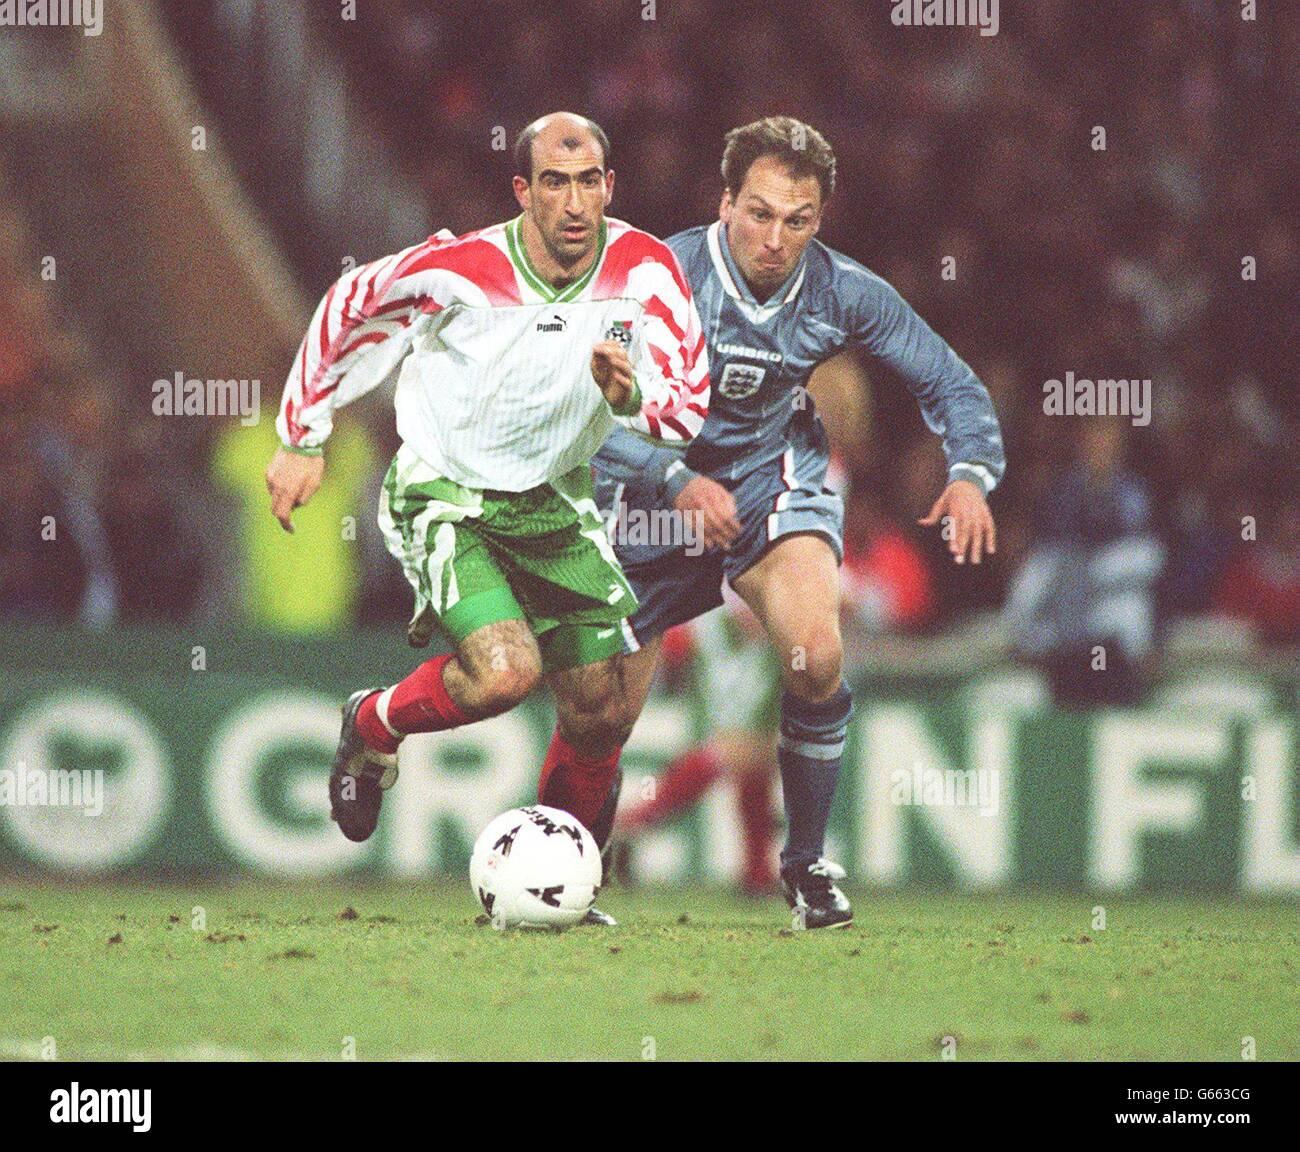 Fussball England Bulgarien Stockfoto Bild 107084560 Alamy